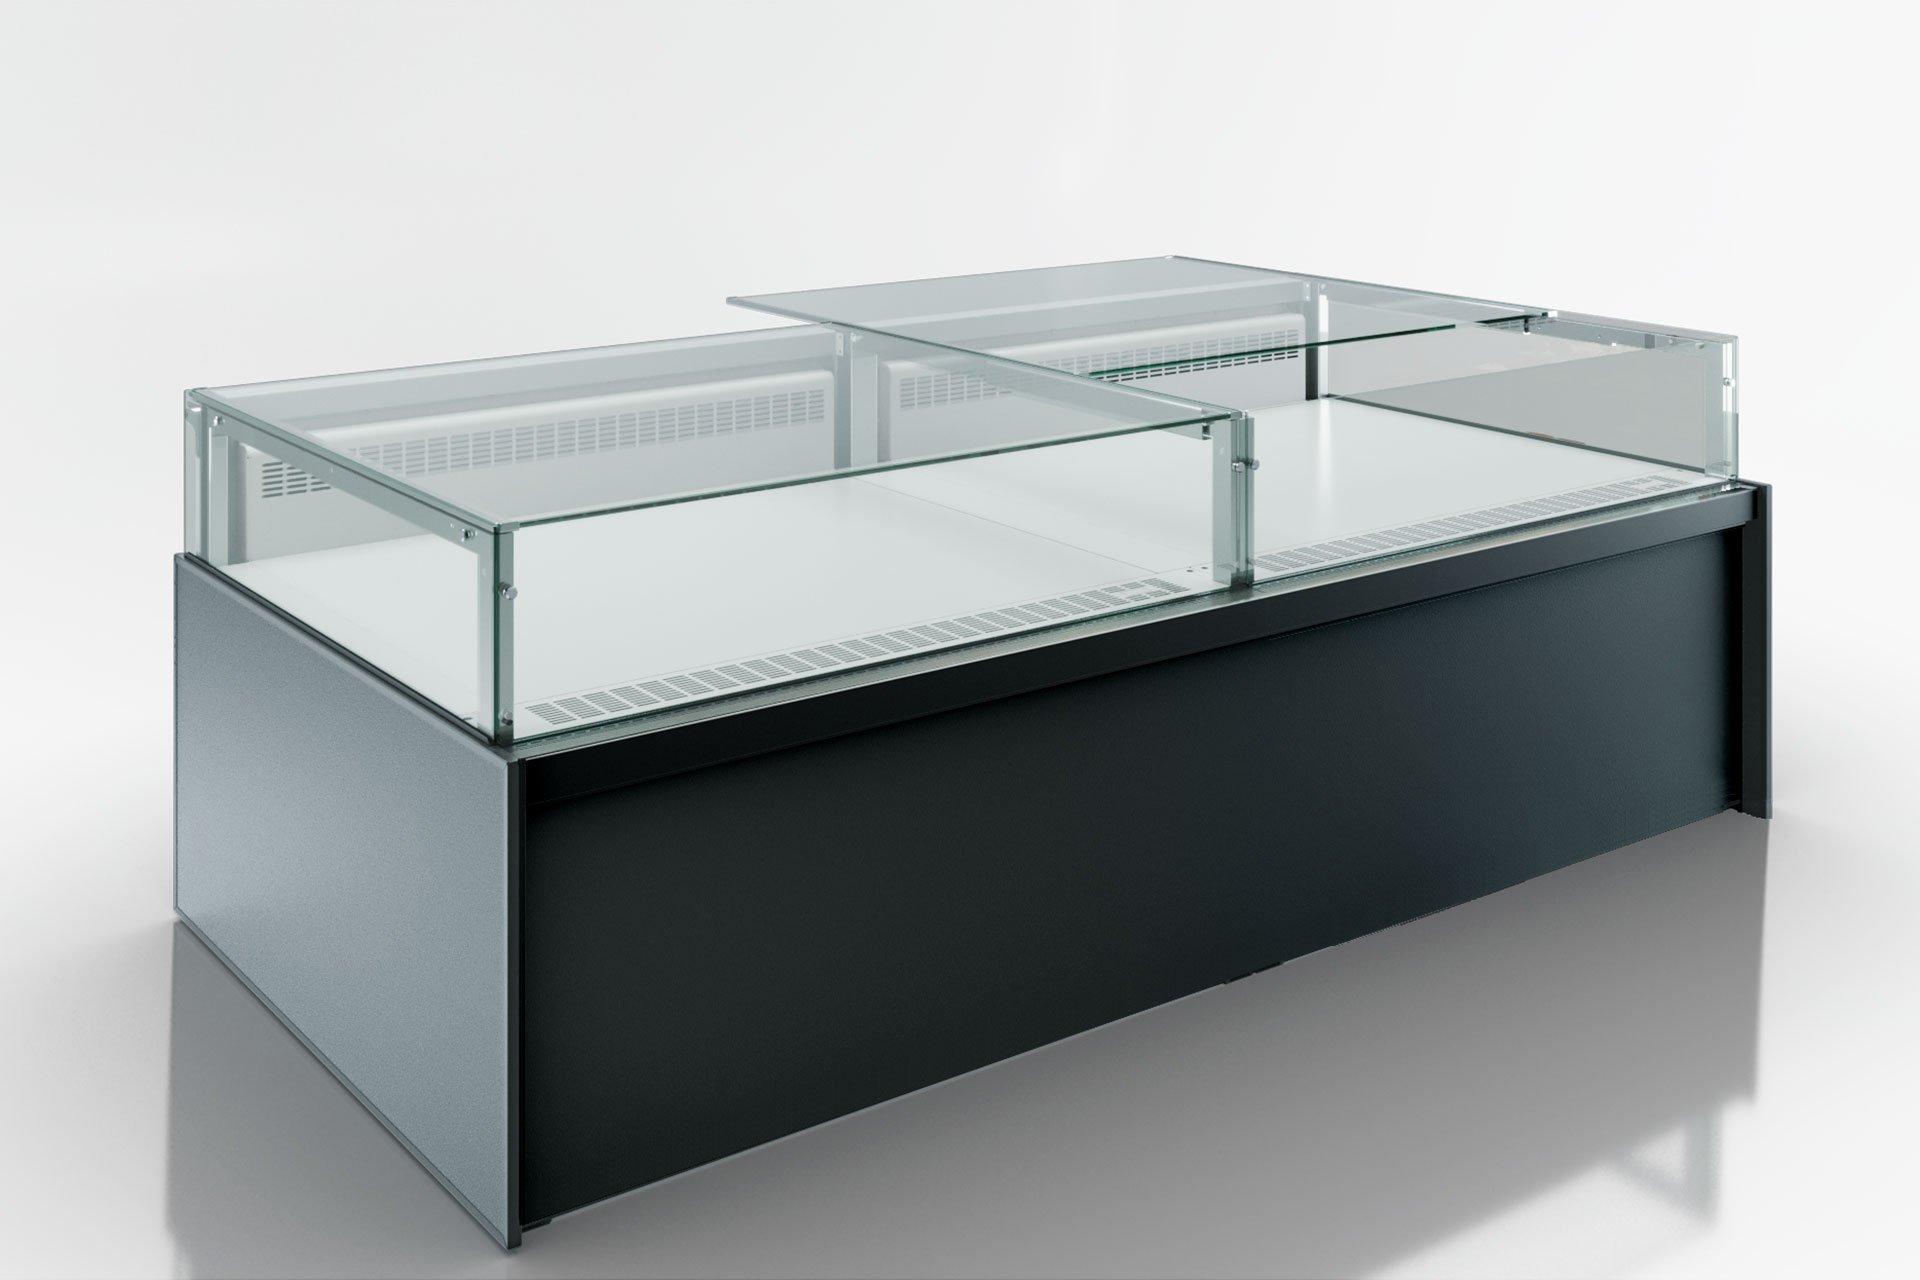 Refrigerated counters Missouri MC 120 patisserie СН SP 090-DLM/DLA